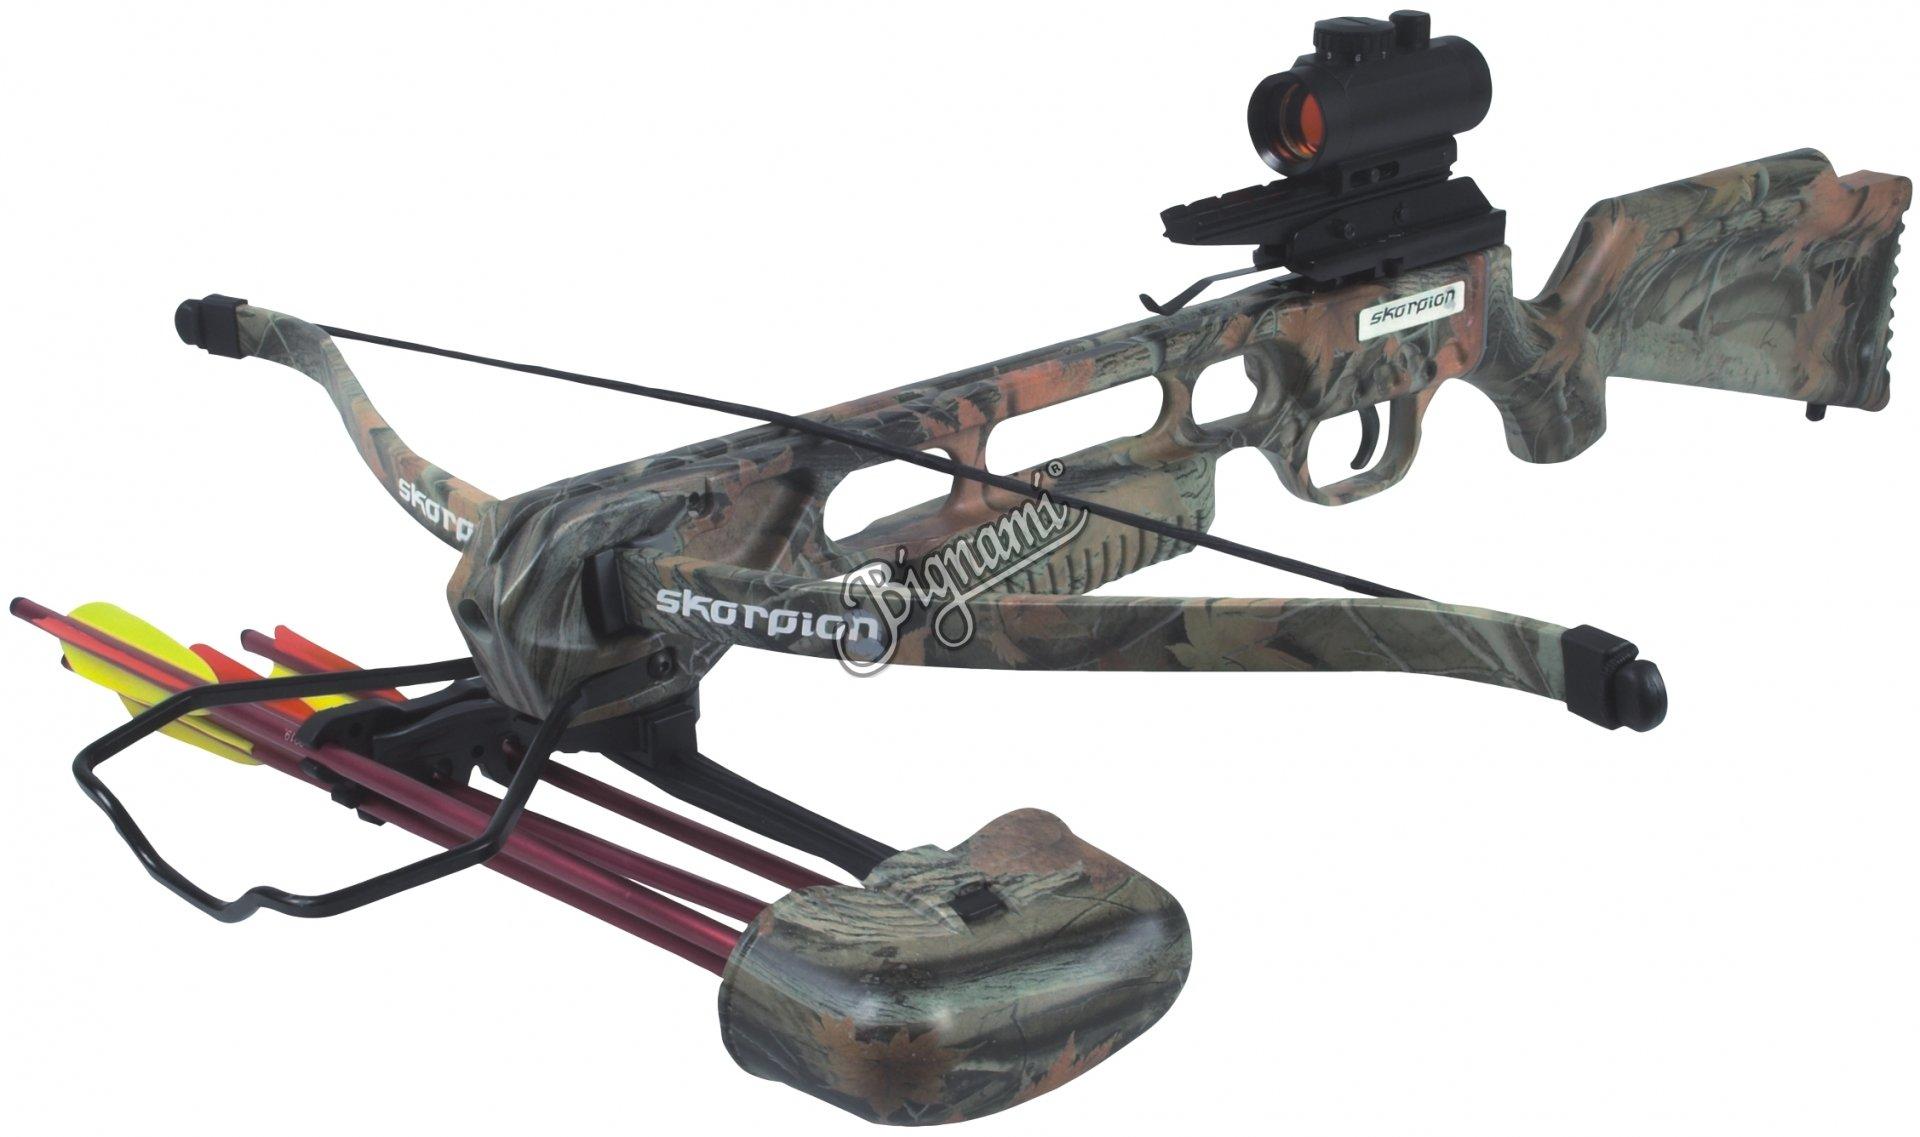 Skorpion Armbrust XBR 100 CM 175# SET